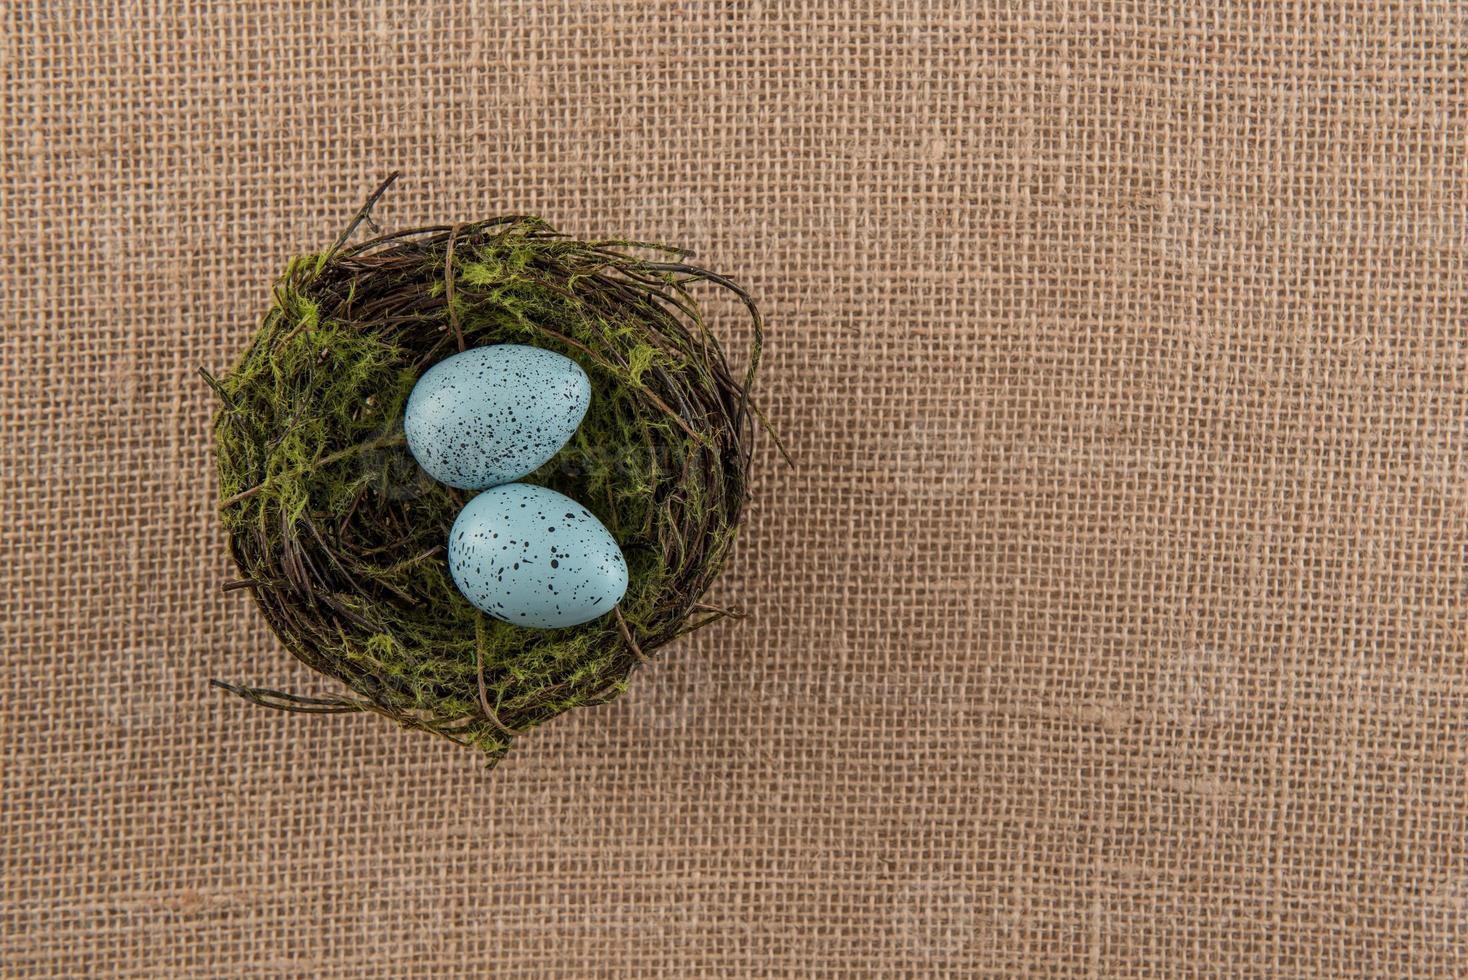 uova macchiate blu nel nido foto